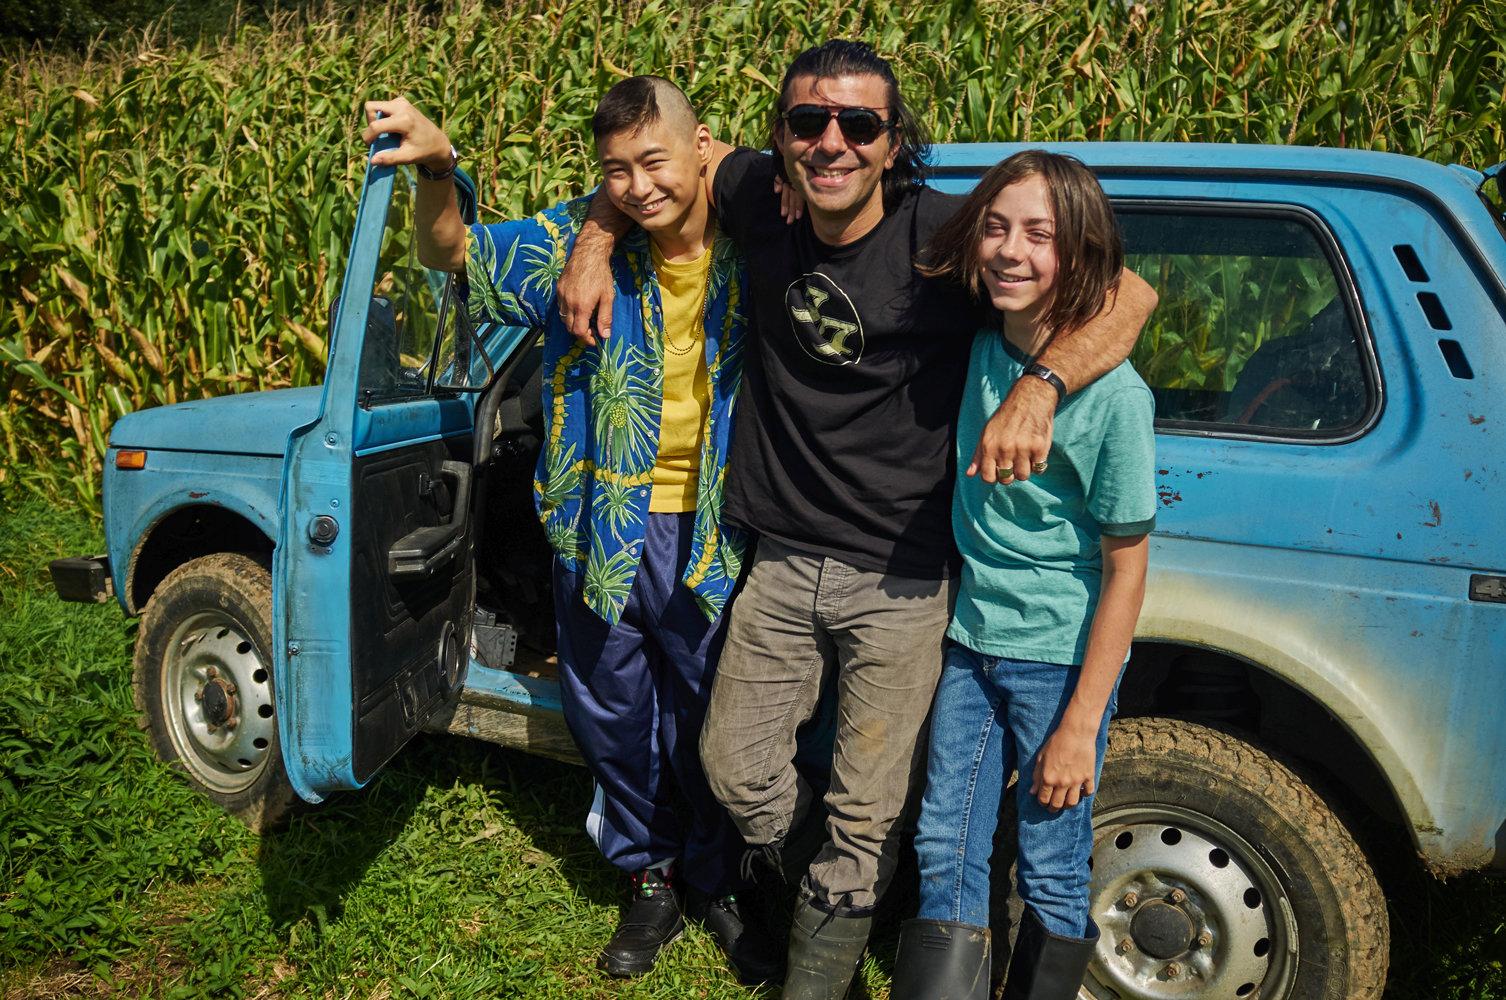 Marrakech International Film Festival: I Am Twenty, Zoology, Orphan, A Talk with Abderrahmane Sissako, & More